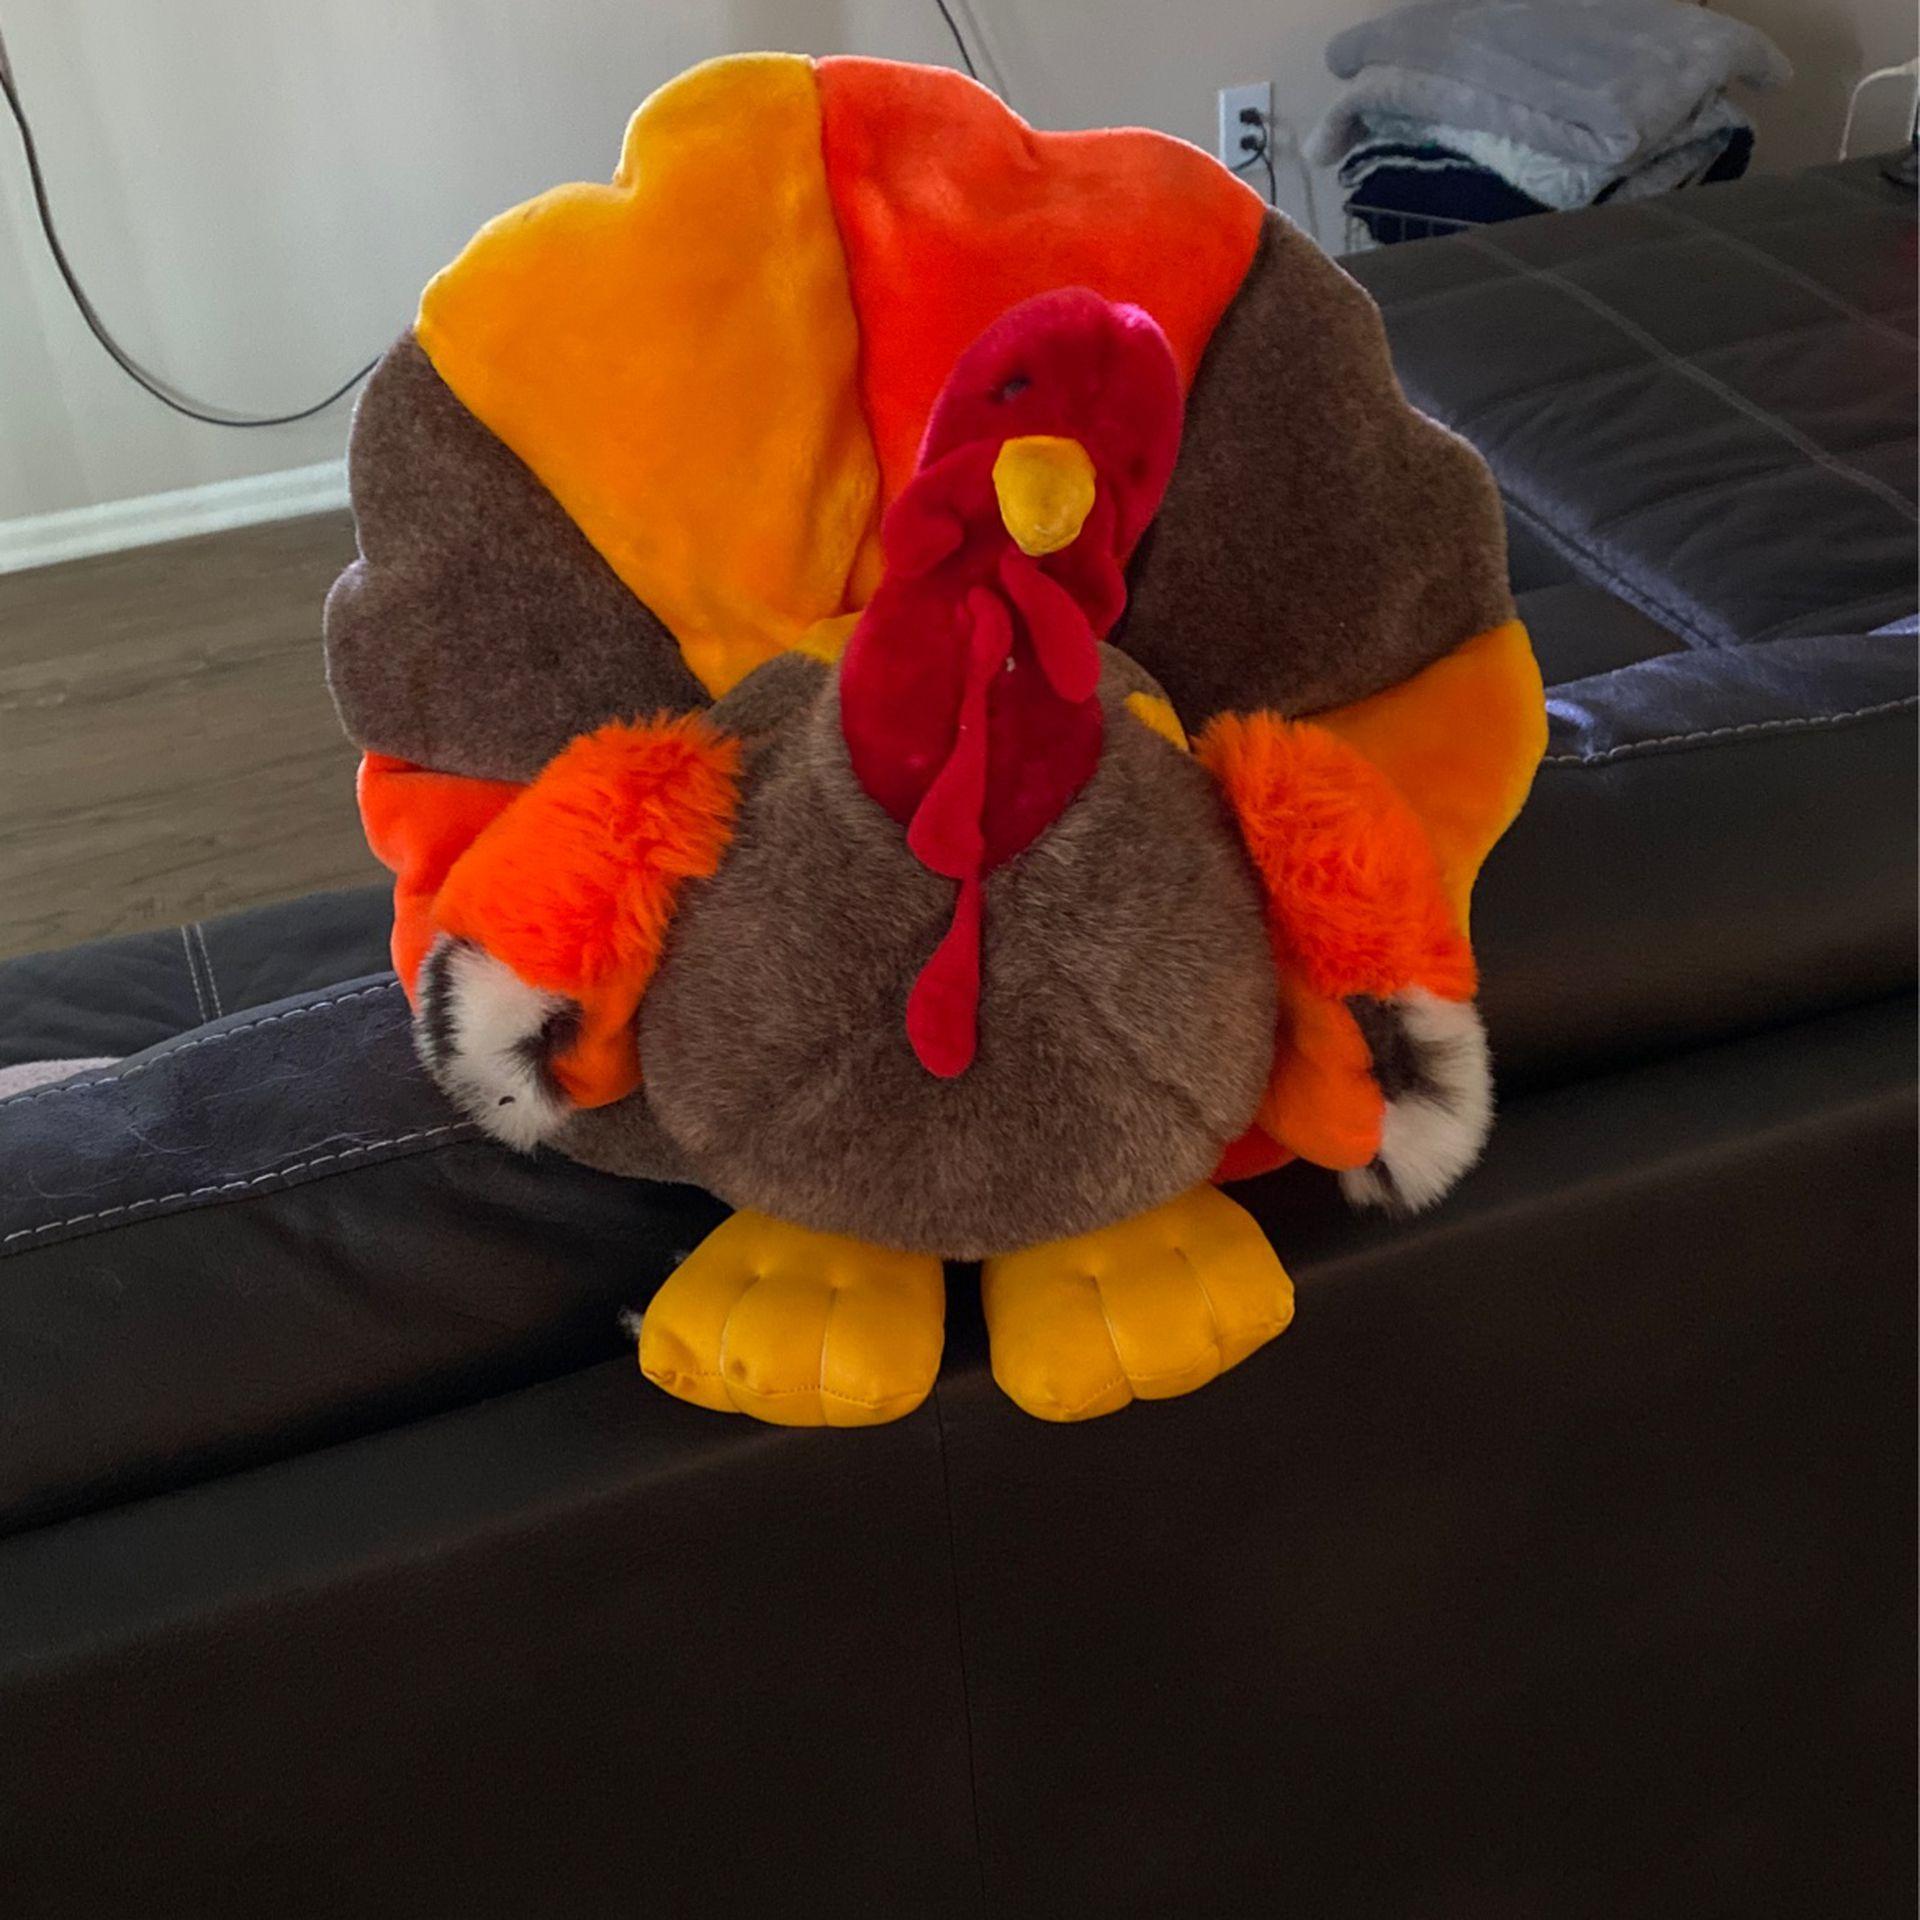 Turkey Plush - Happy Thanksgiving